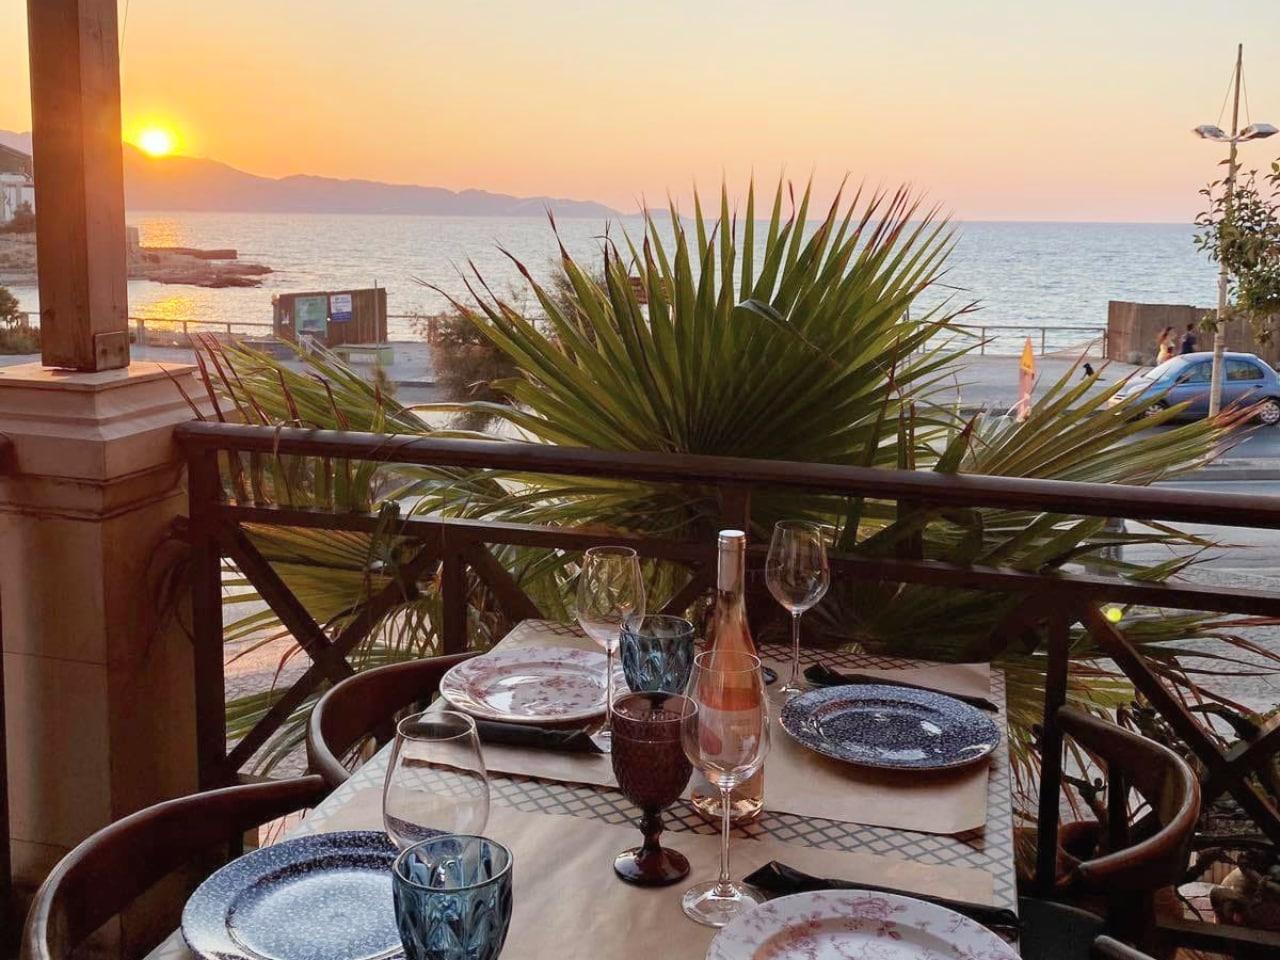 parasties restaurant heraklion Crete, parasies restaurant iraklion crete, where to eat heraklion, gastronomy heraklion crete, what to do heraklion